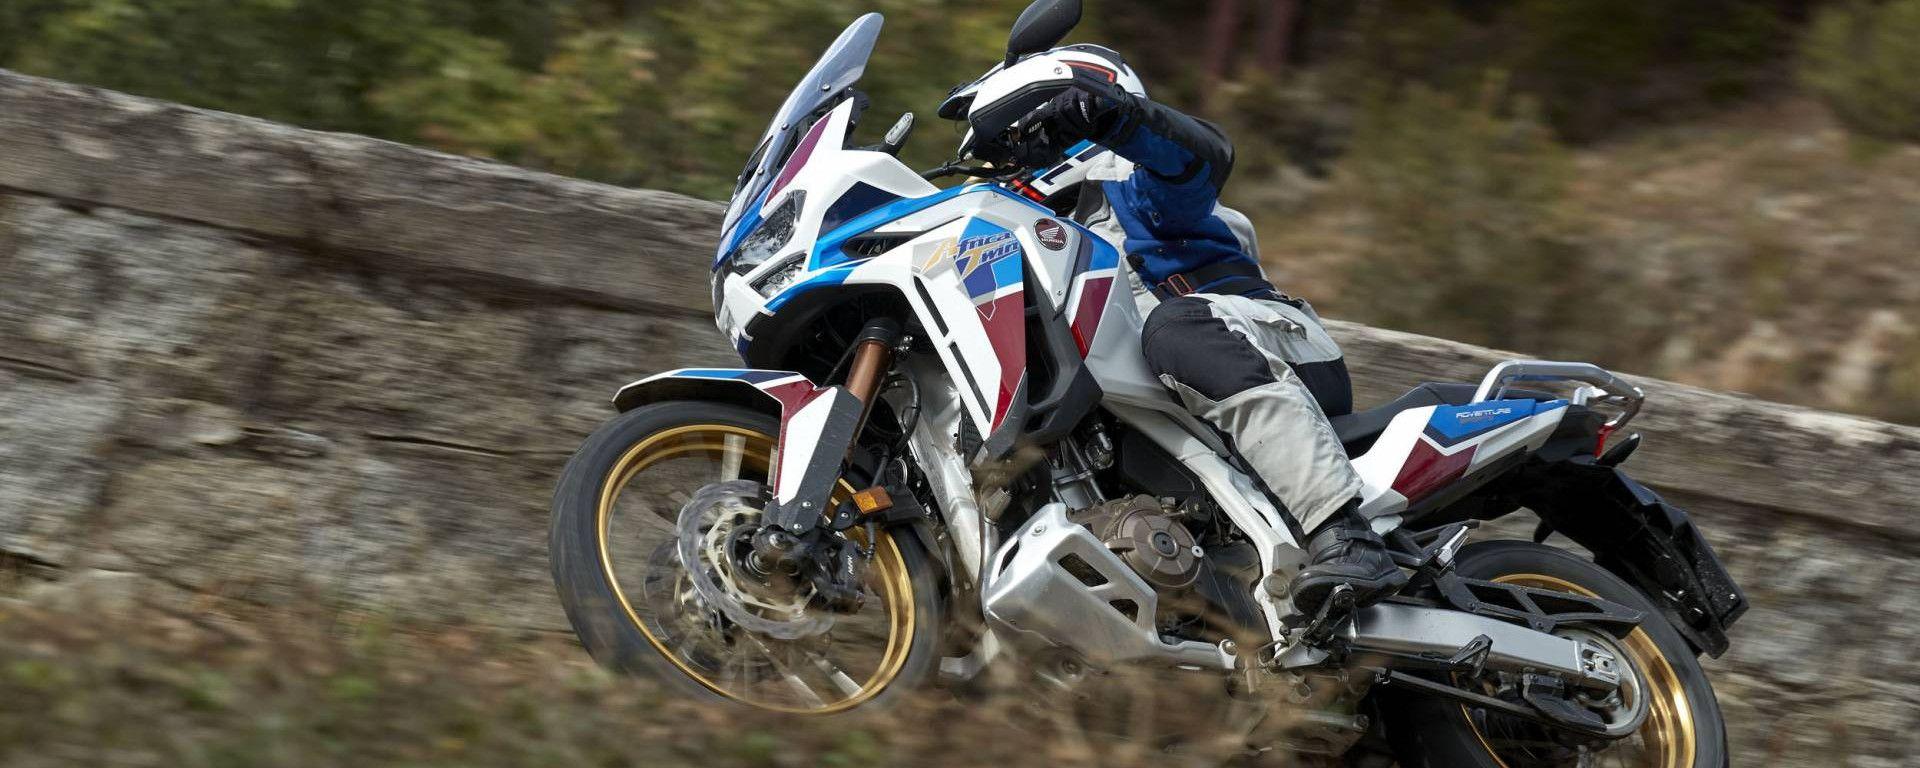 La prova video di Honda Africa Twin e Africa Twin Adventure Sports